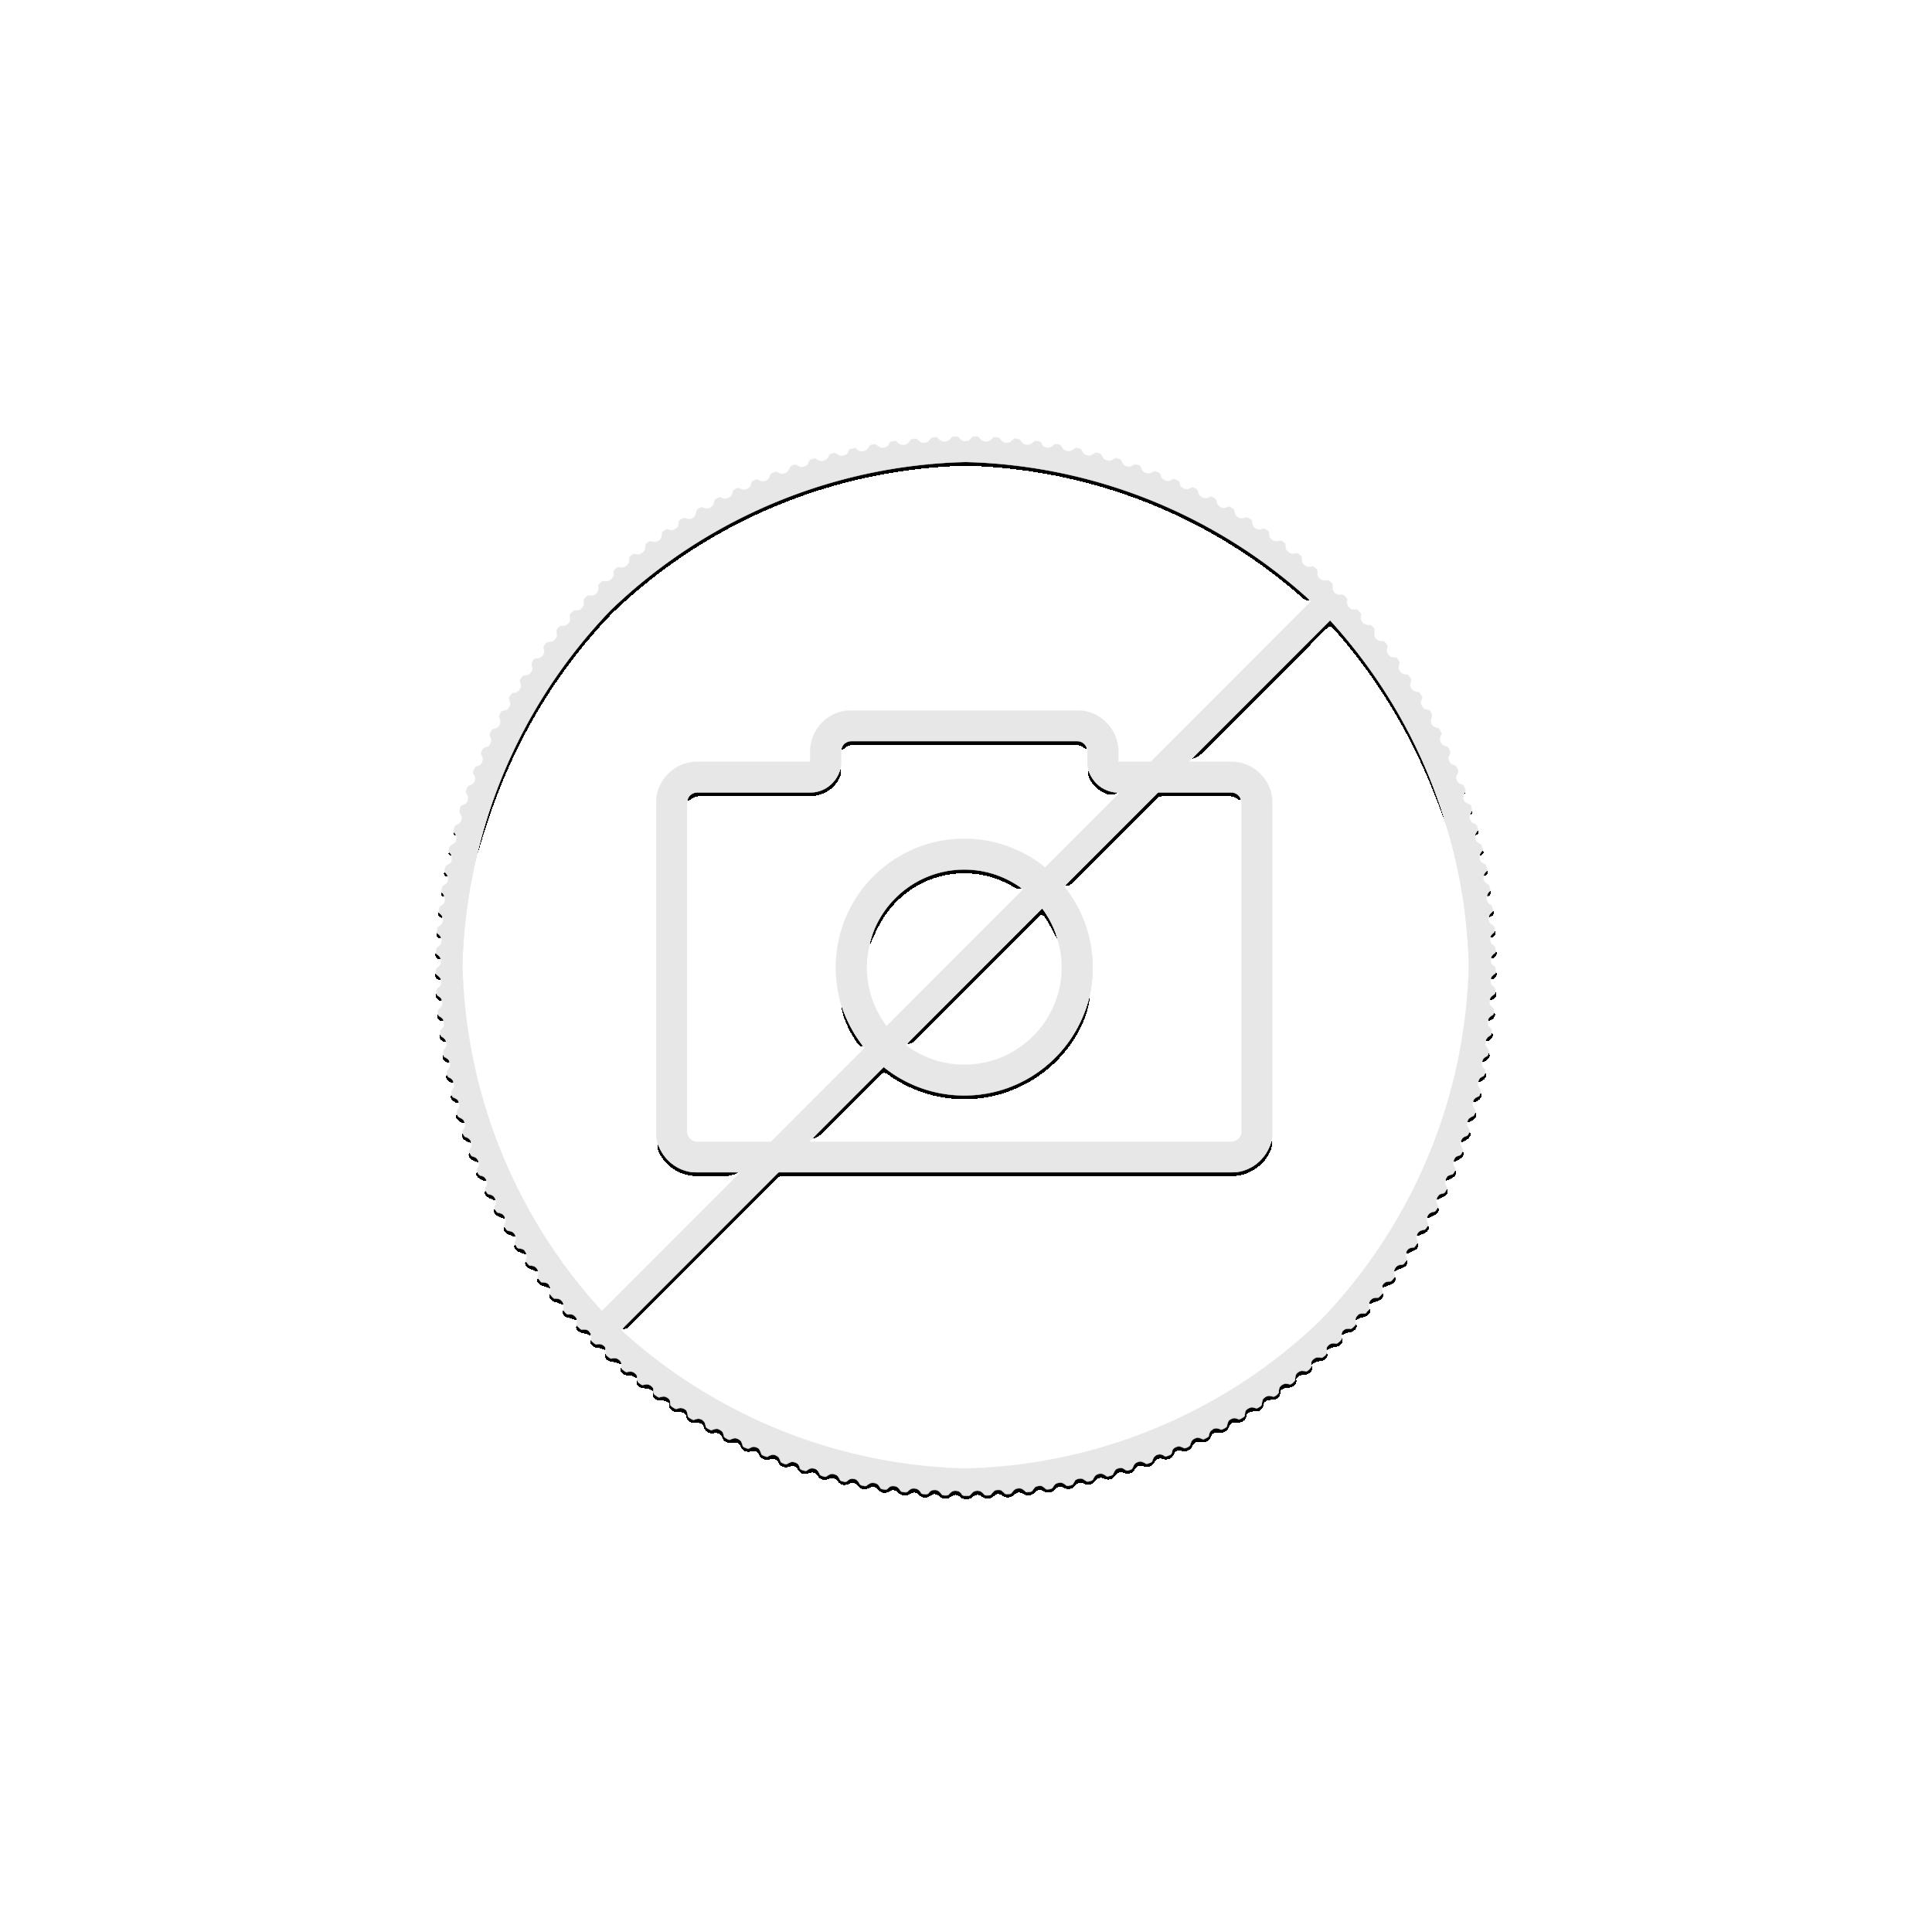 1 Troy ounce gouden munt Lunar 2019 Proof